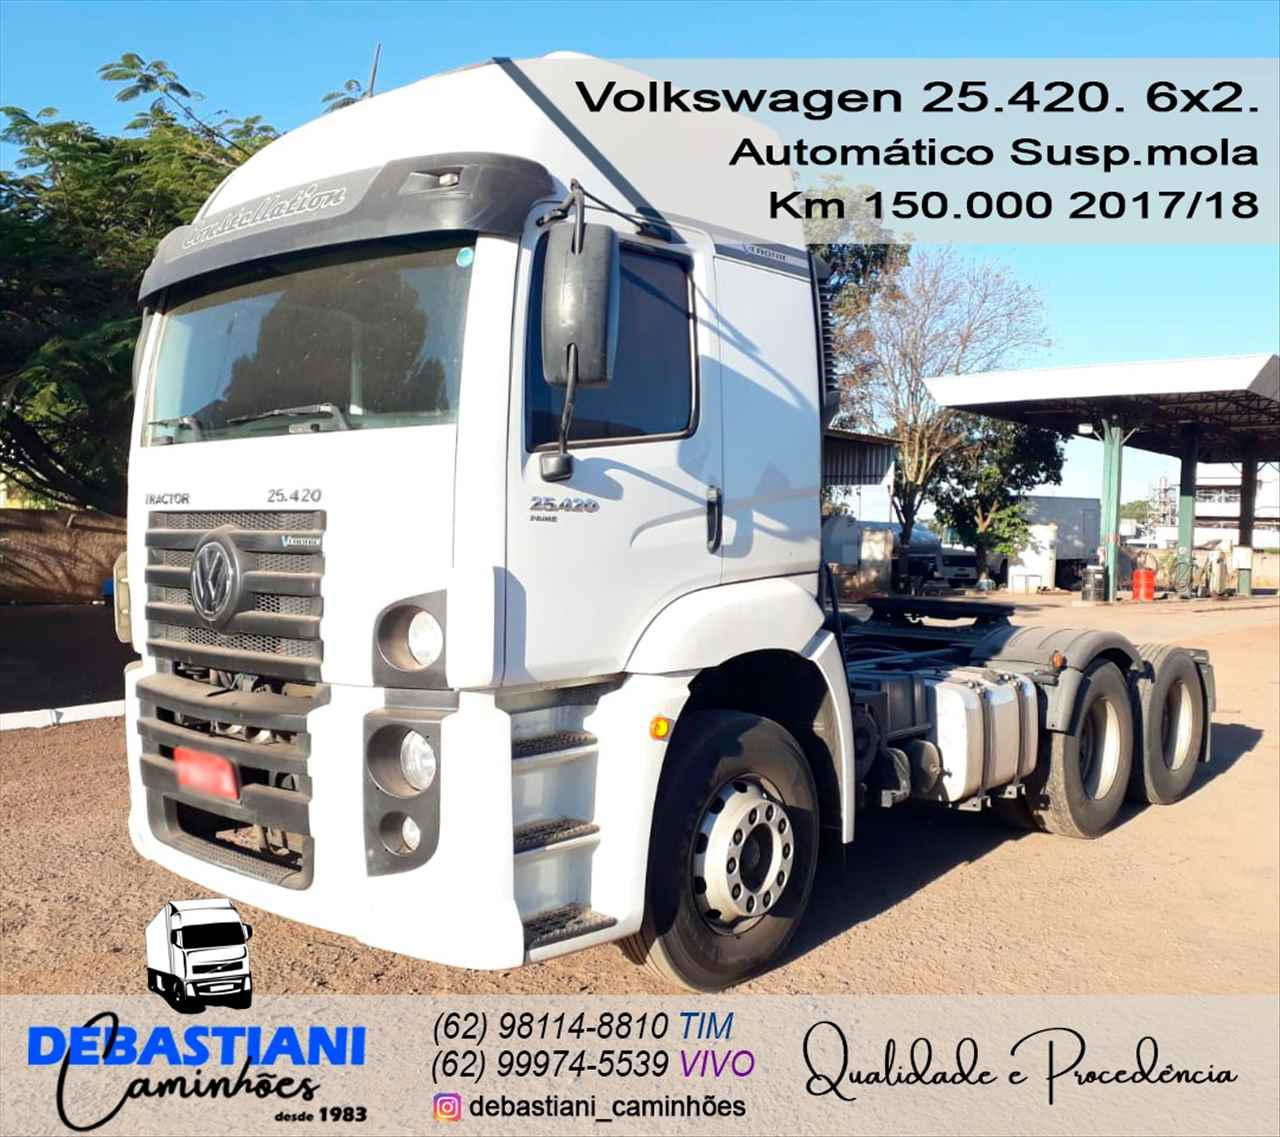 CAMINHAO VOLKSWAGEN VW 25420 Cavalo Mecânico Truck 6x2 Debastiani Caminhões ANAPOLIS GOIAS GO